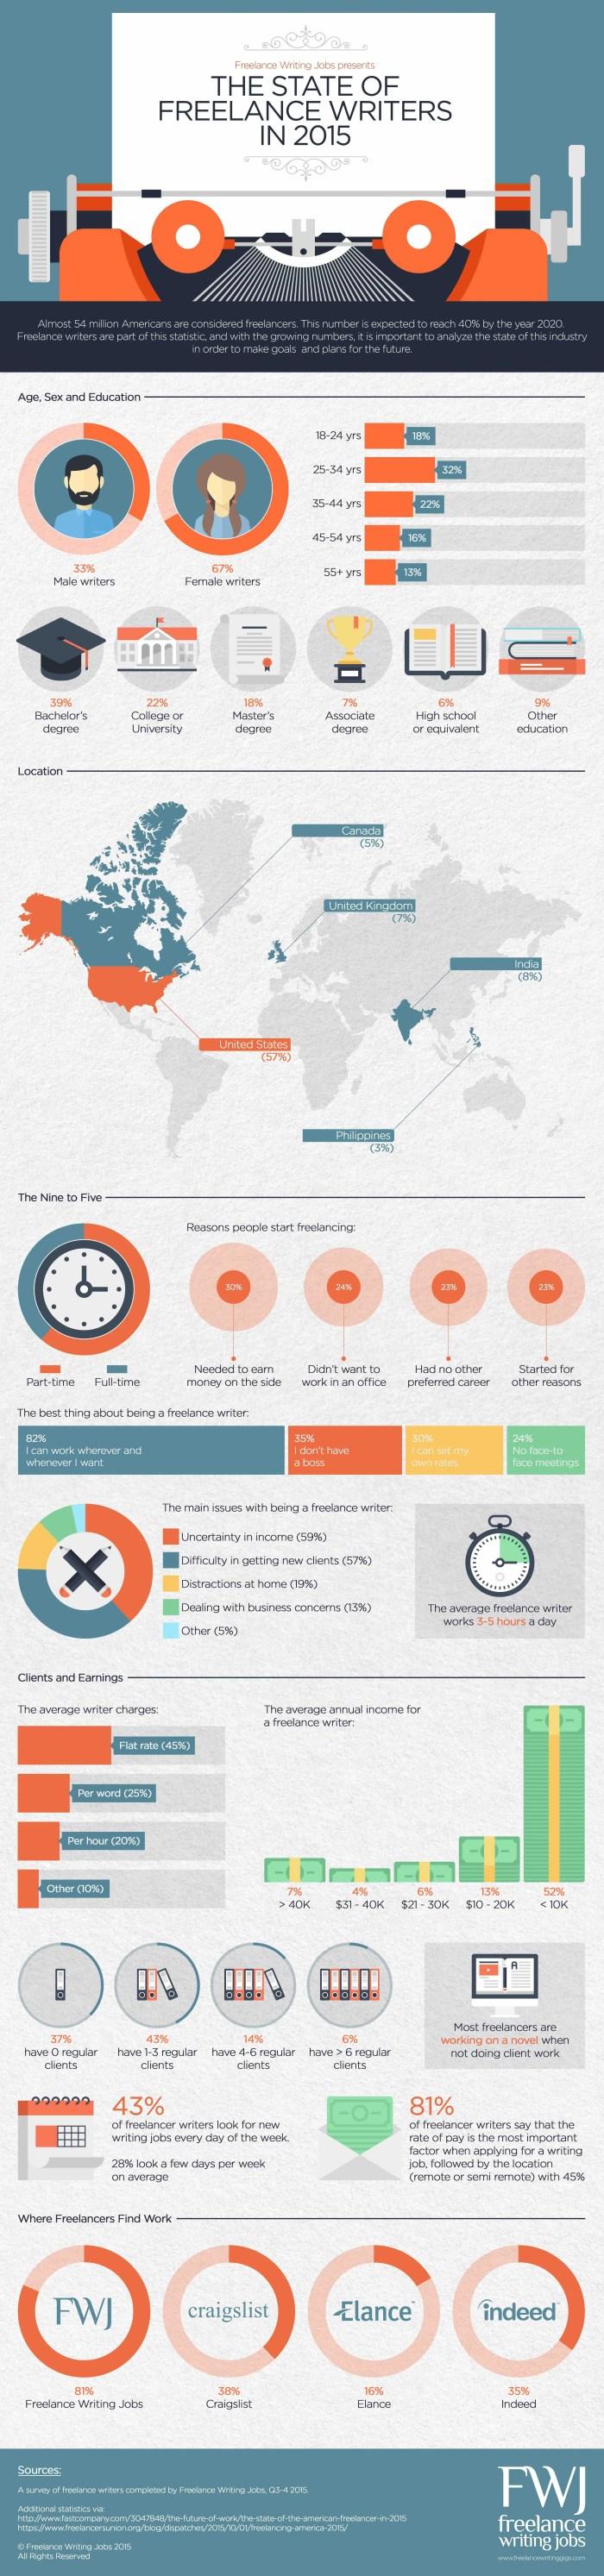 Freelance writing statistics 2015